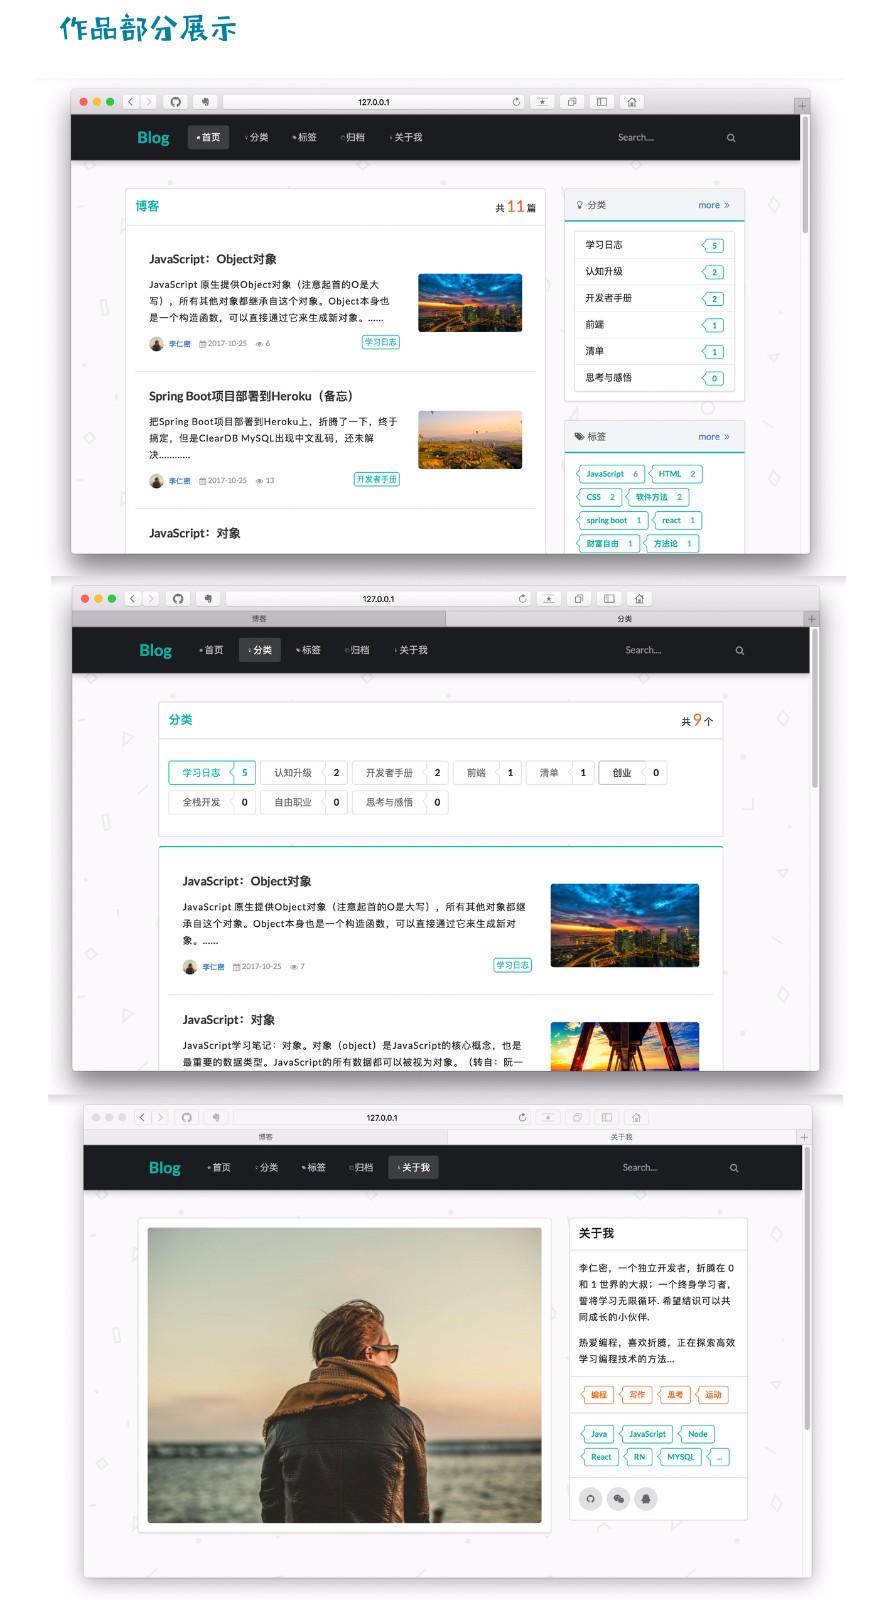 Spring Boot开发小而美的个人博客详情-2.jpg